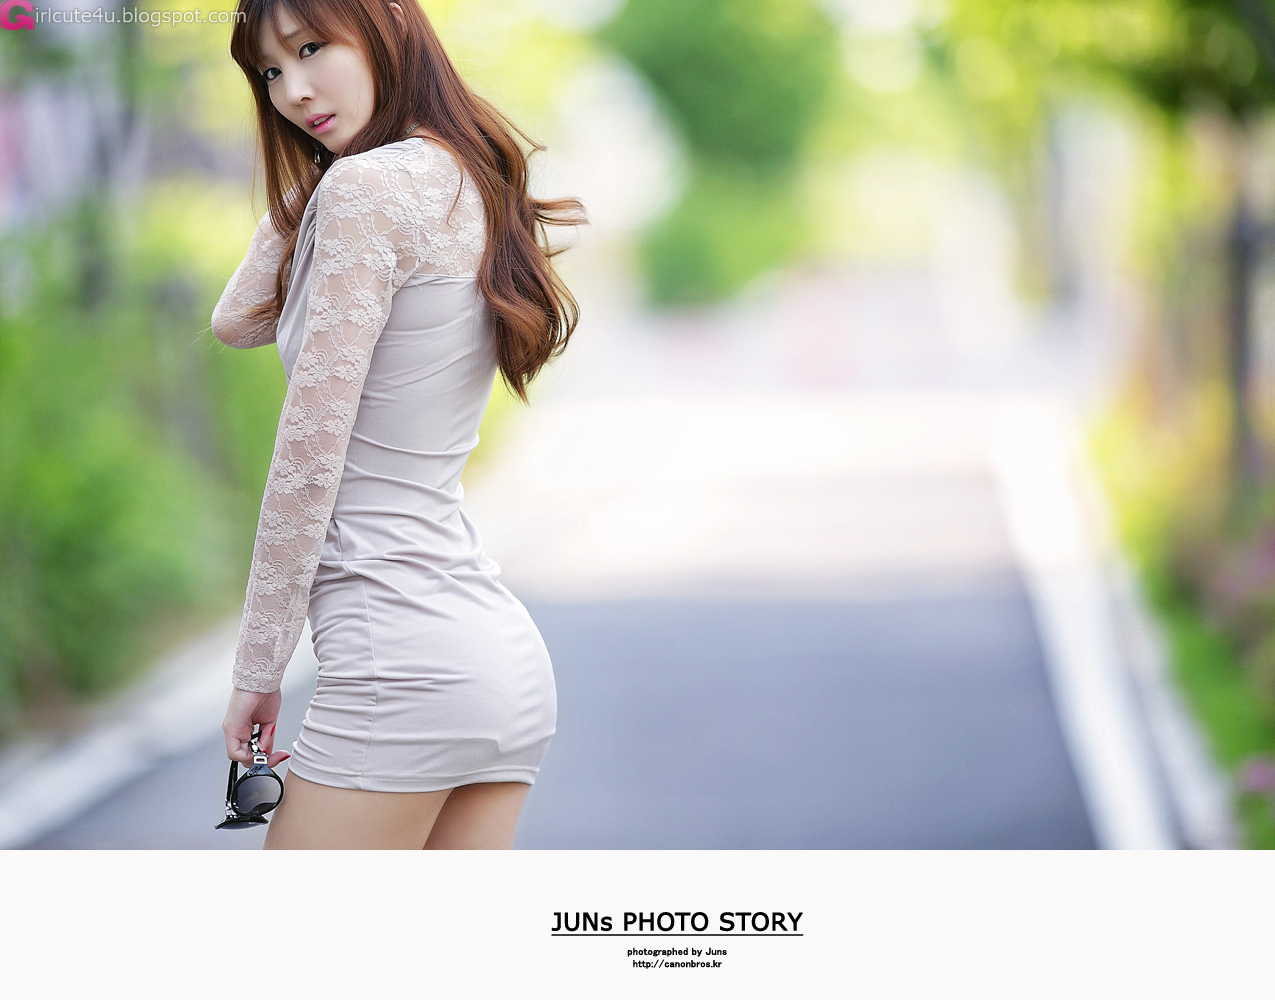 Long Legs Lee Yoo Eun